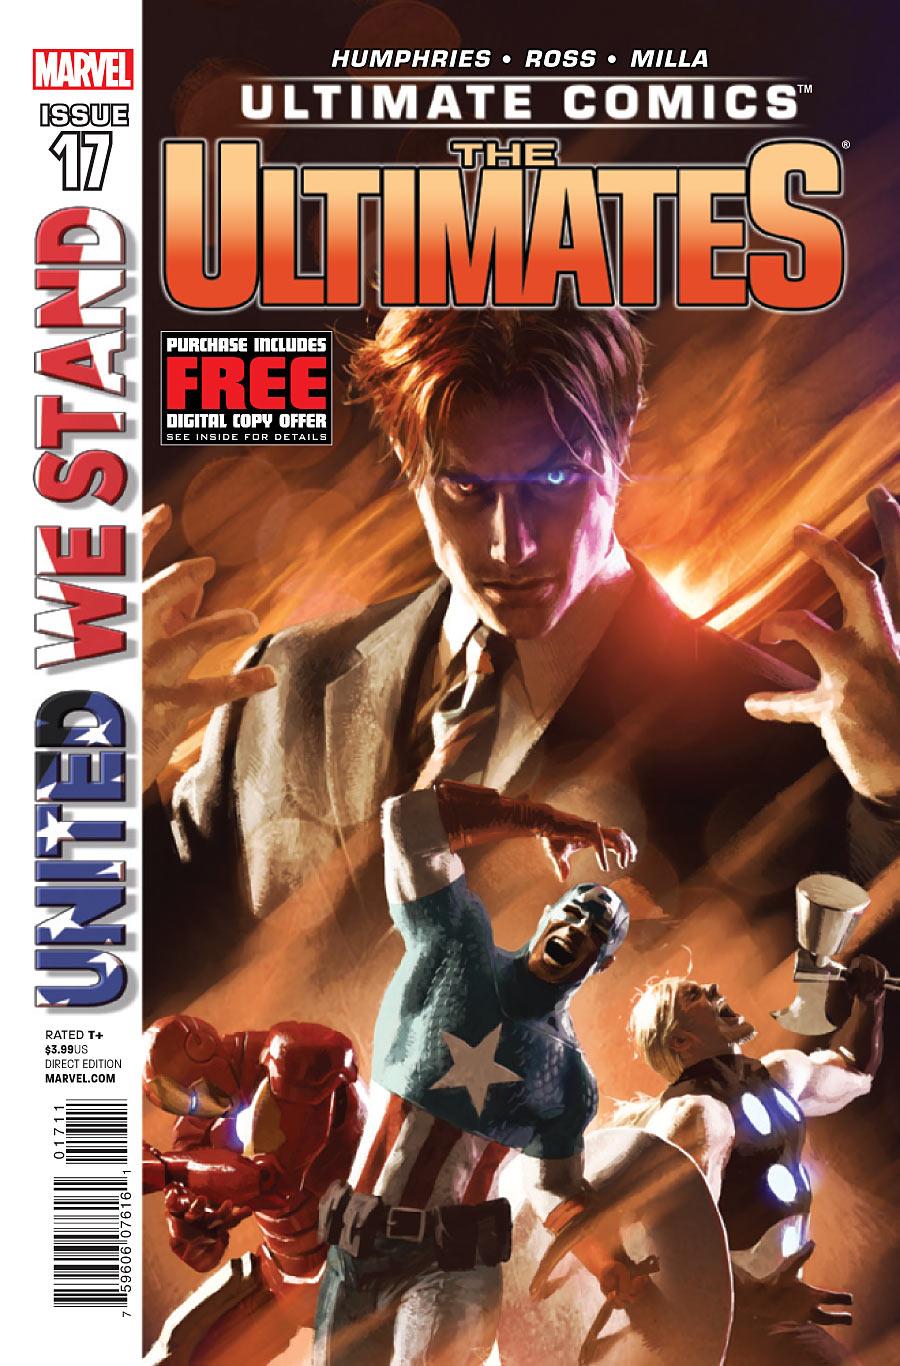 Ultimate Comics: The Ultimates #17